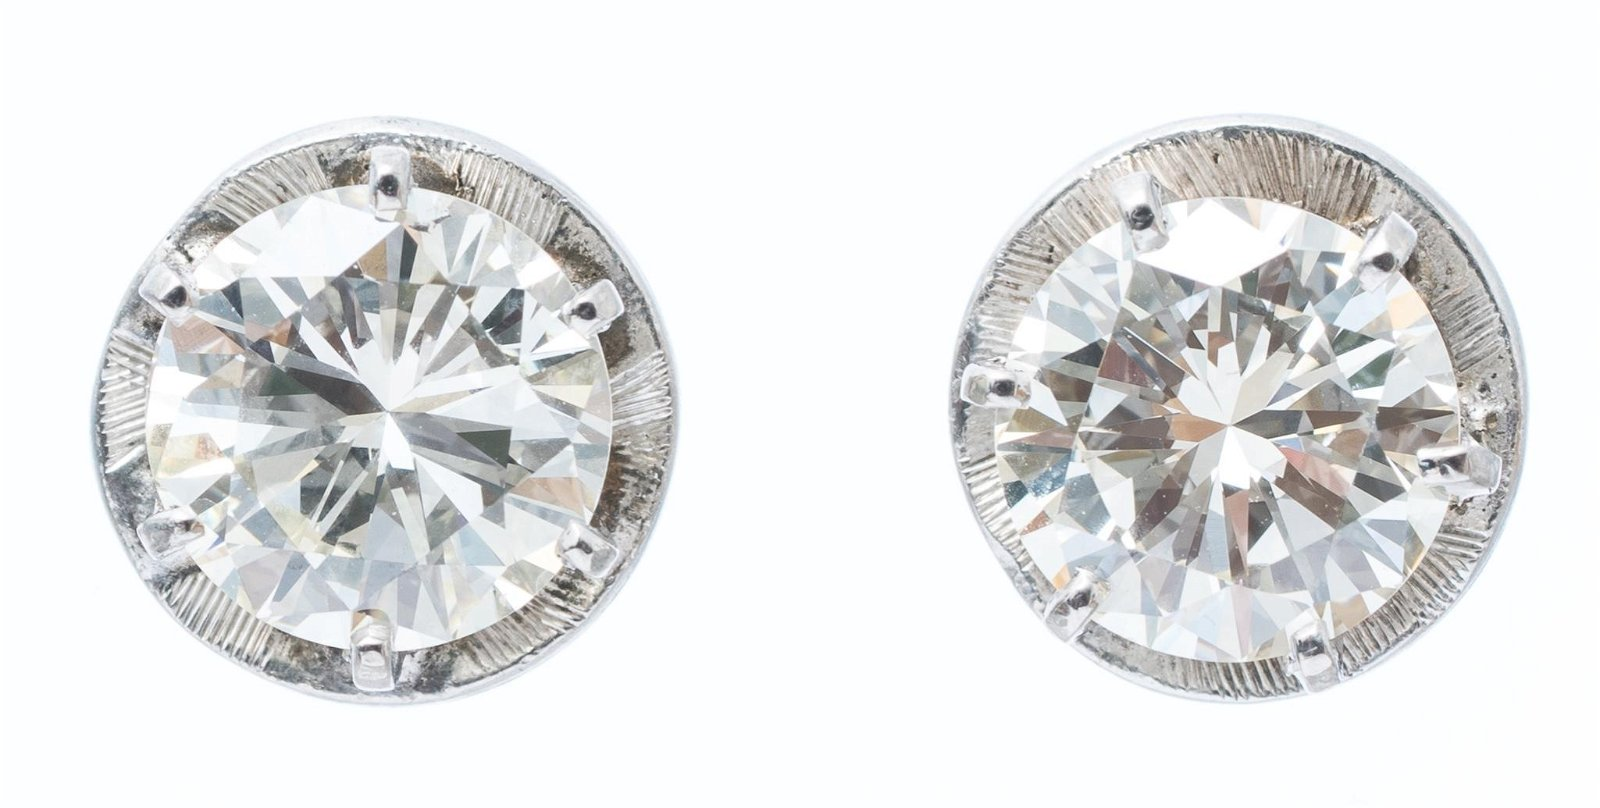 4.01ctw. Diamond Stud Earrings GIA Certified